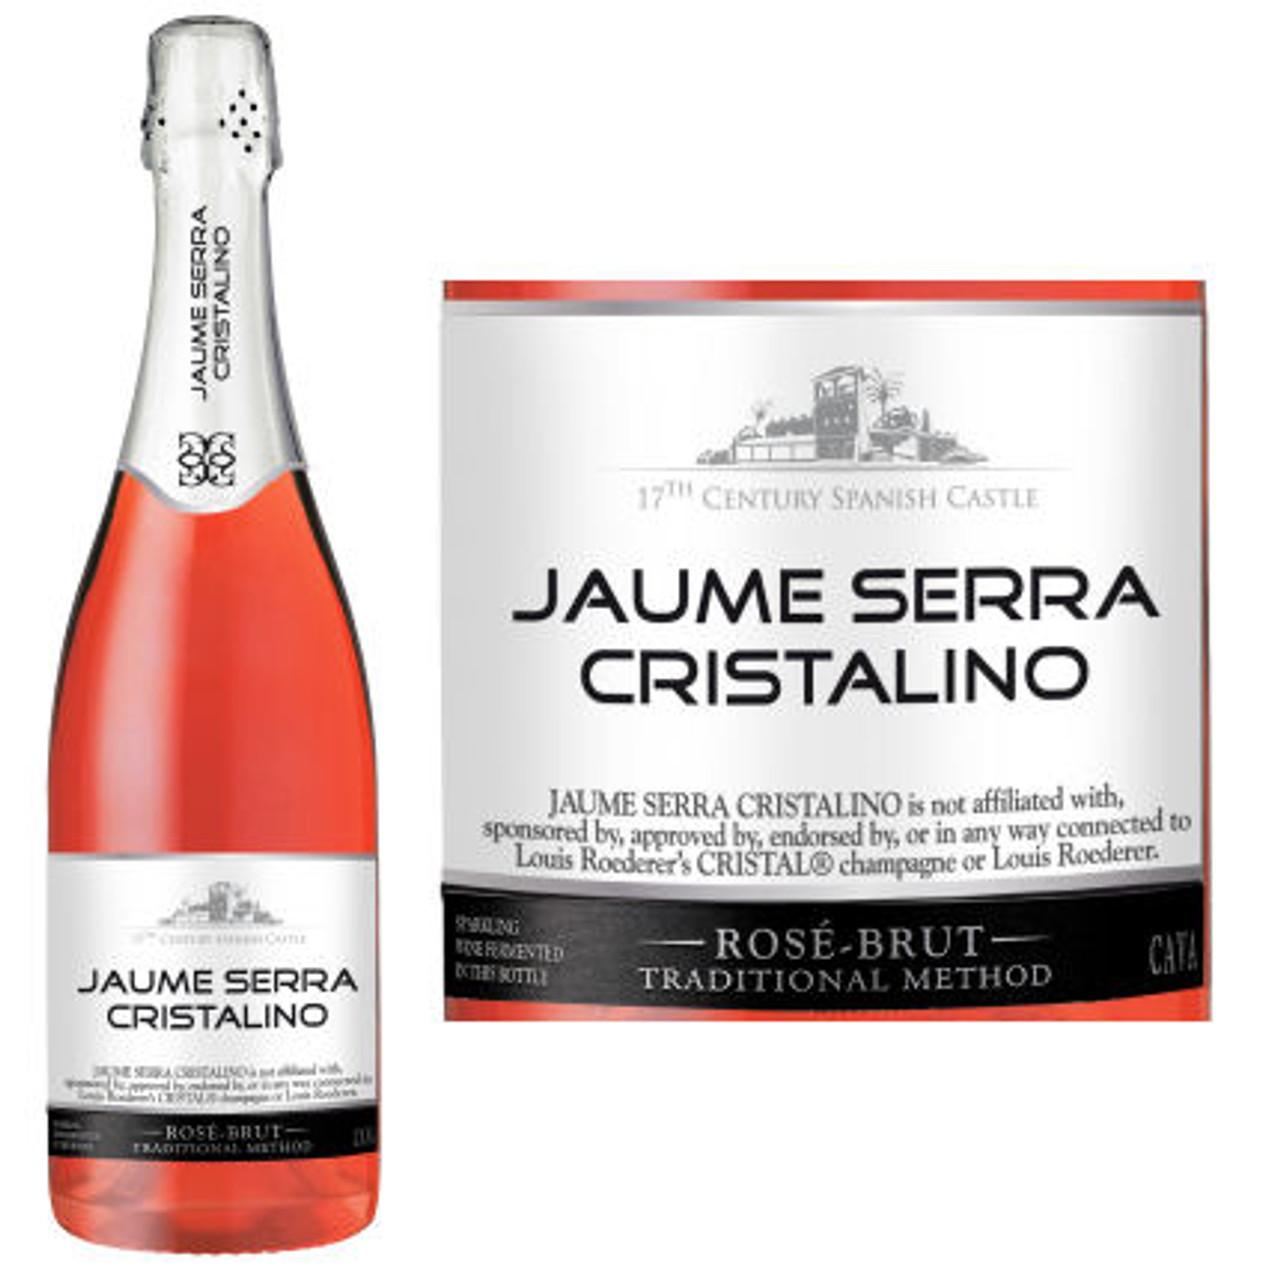 Jaume Serra Cristalino Brut Rose Cava NV